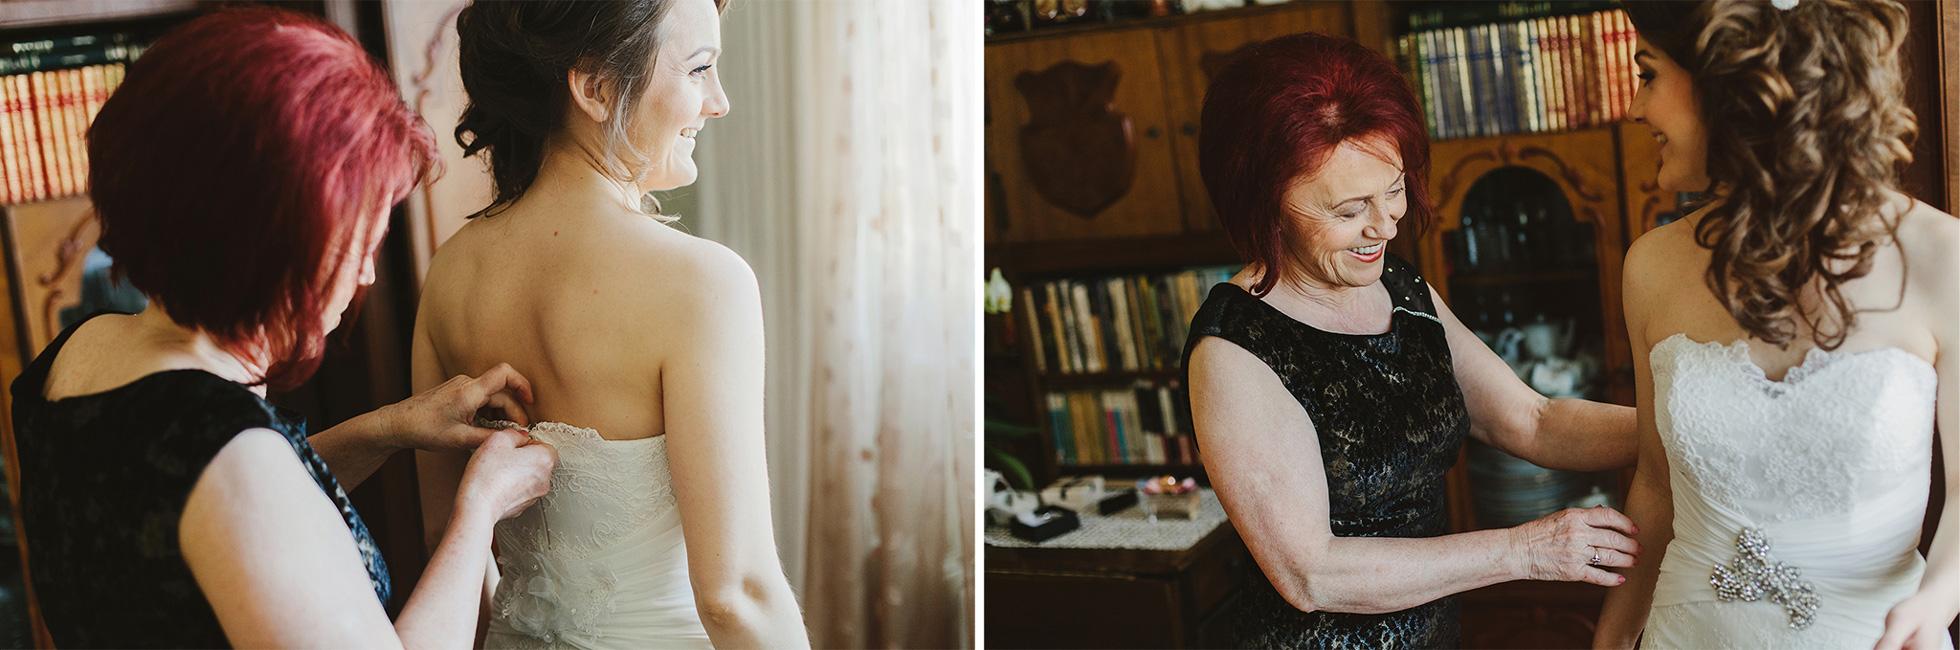 Liana-+-Florin-{wedding}-019